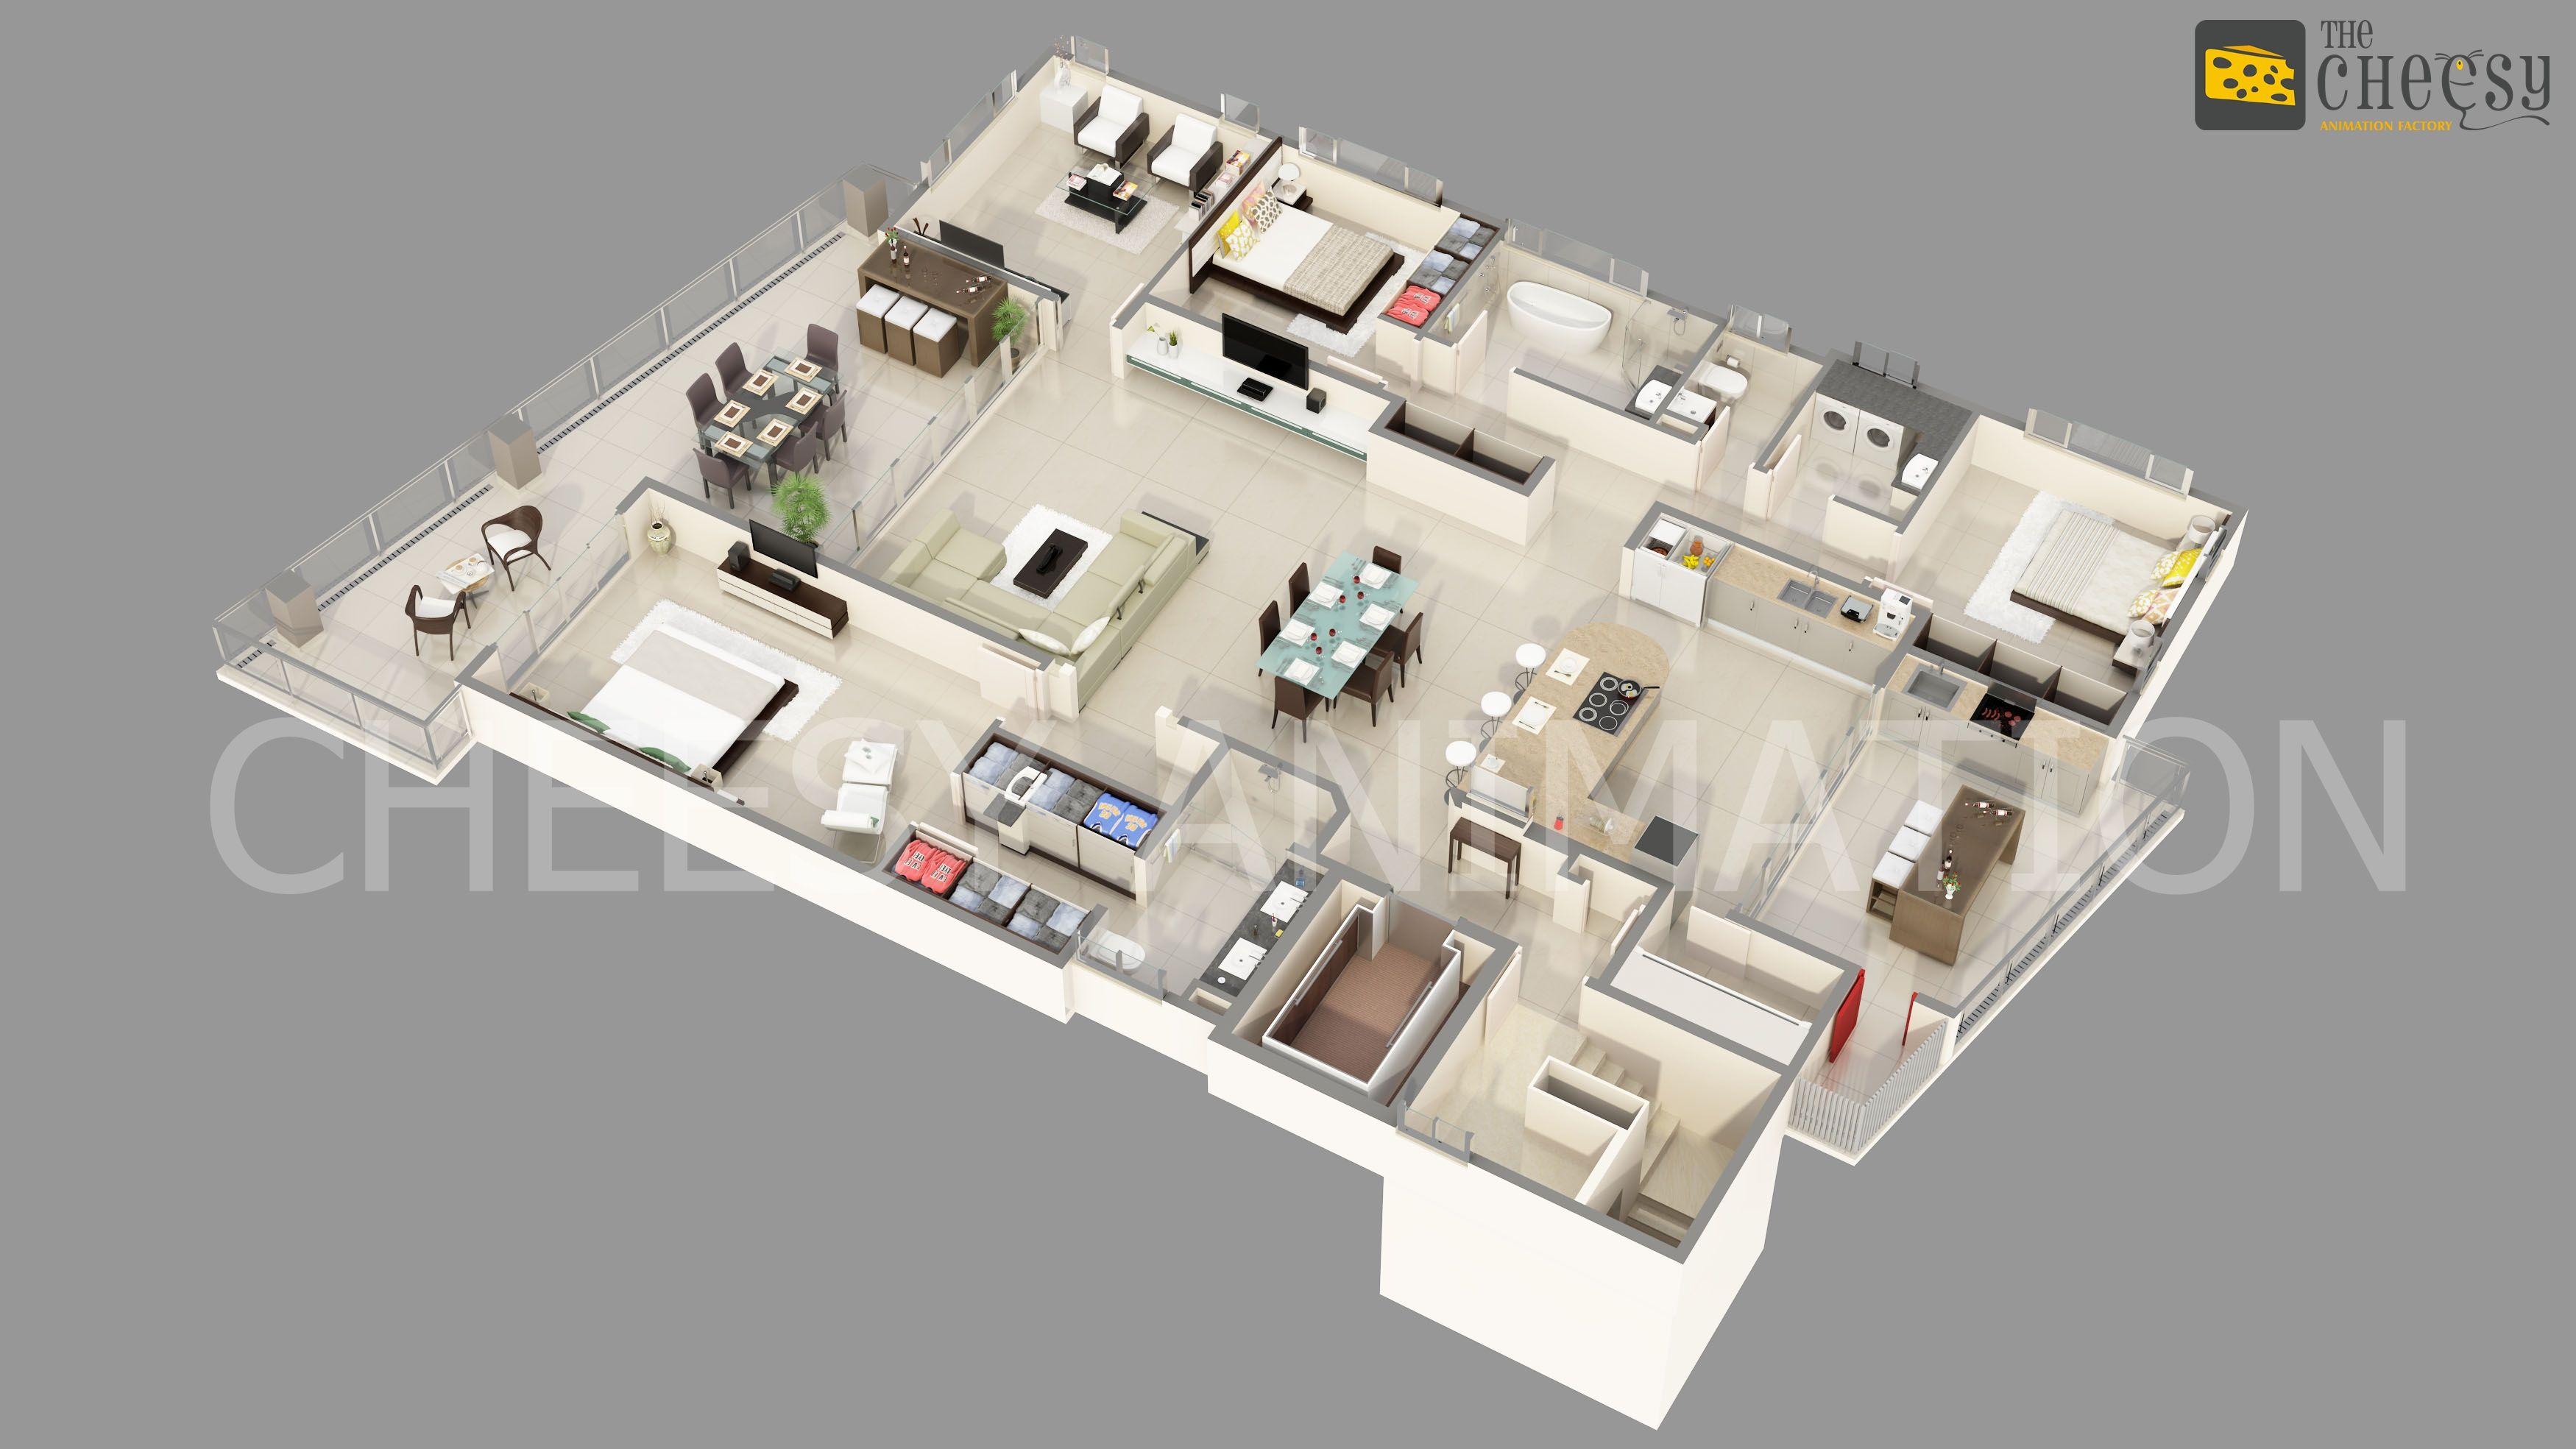 The Cheesy Animation Factory Specialists In 3d Walkthroughs 3d Rendering Architectural 3d Animations 3d Ex Floor Plan Design Floor Plans Rendered Floor Plan